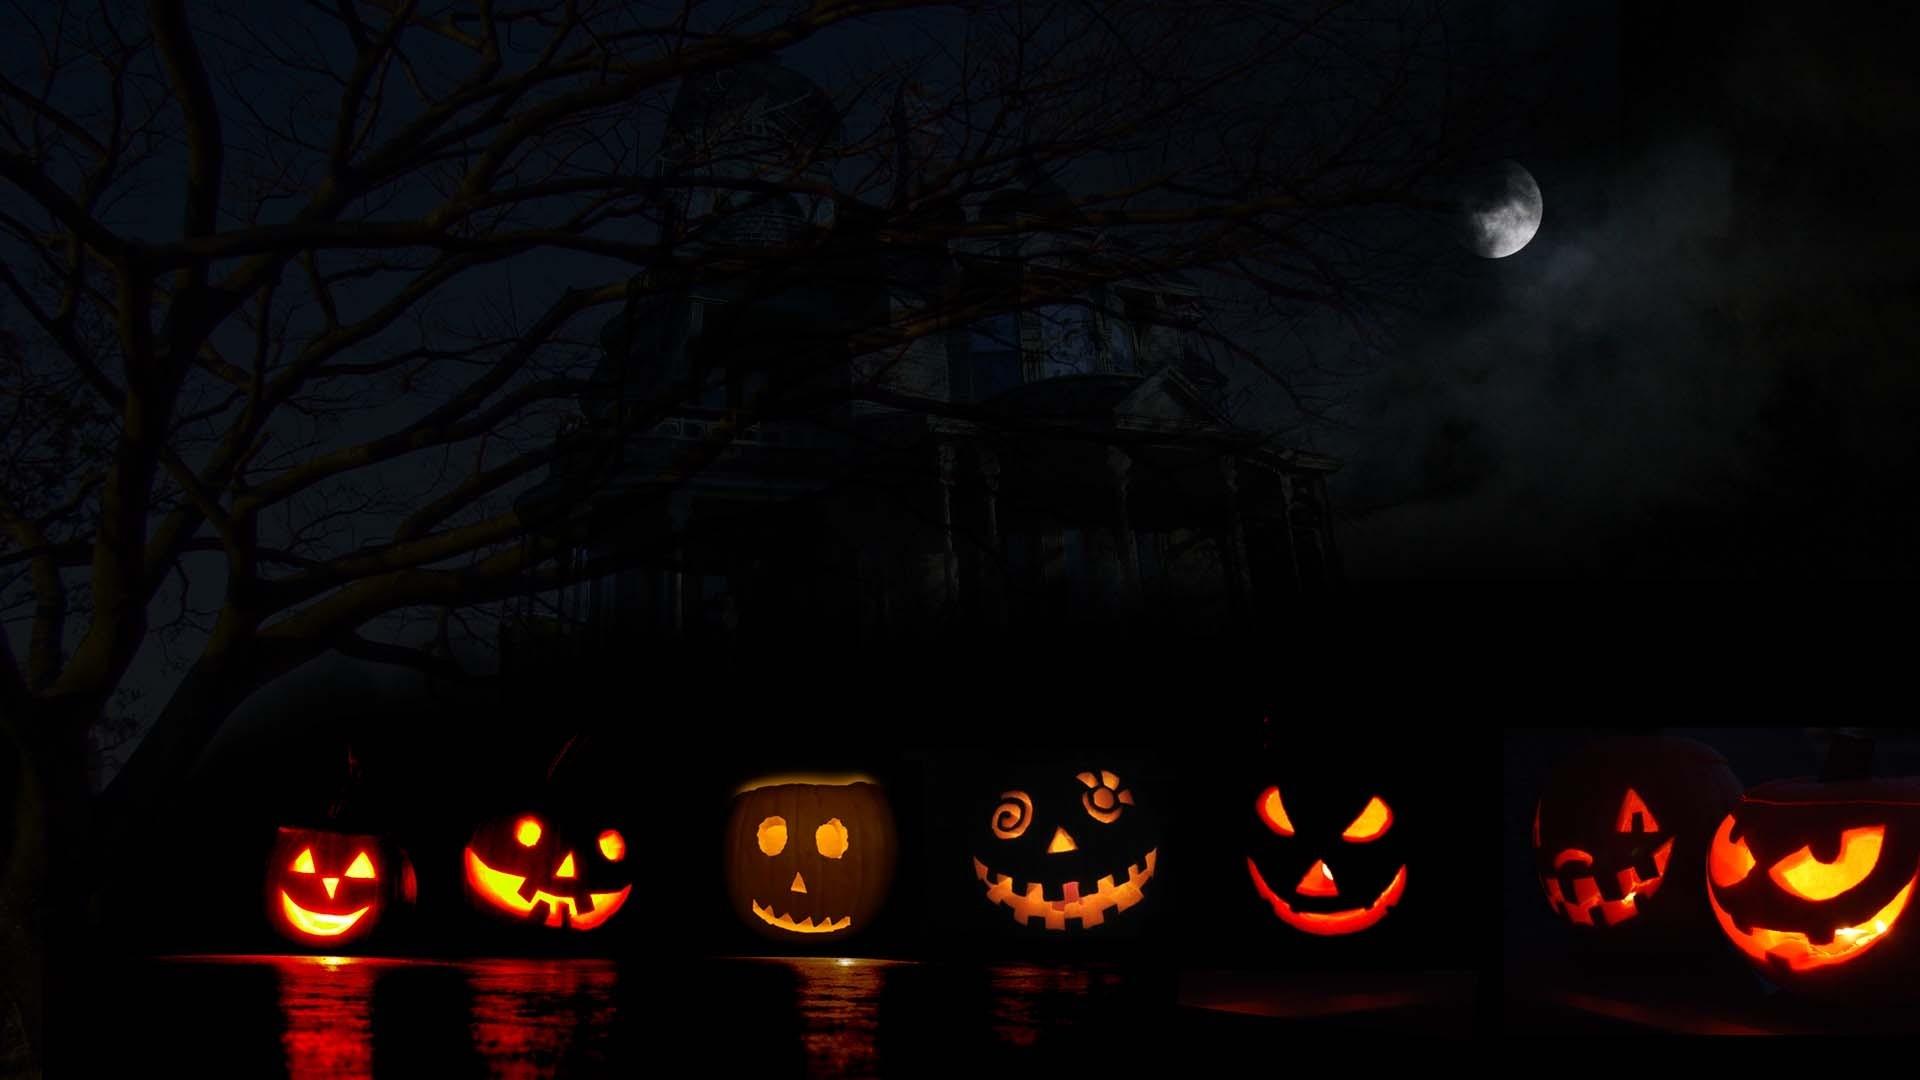 … Animated Halloween Backgrounds For Desktop (14) …